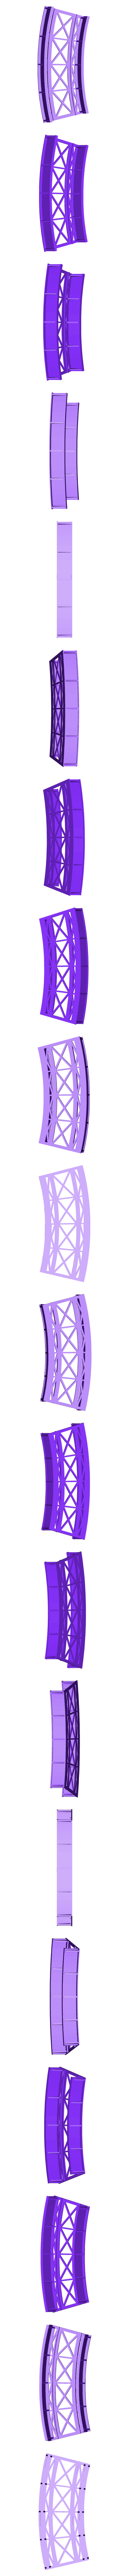 360mm_15_R_Bridge_for_Marklin_24130.stl Download free STL file HO Scale Curved Bridge for Marklin Track • 3D printable model, kabrumble